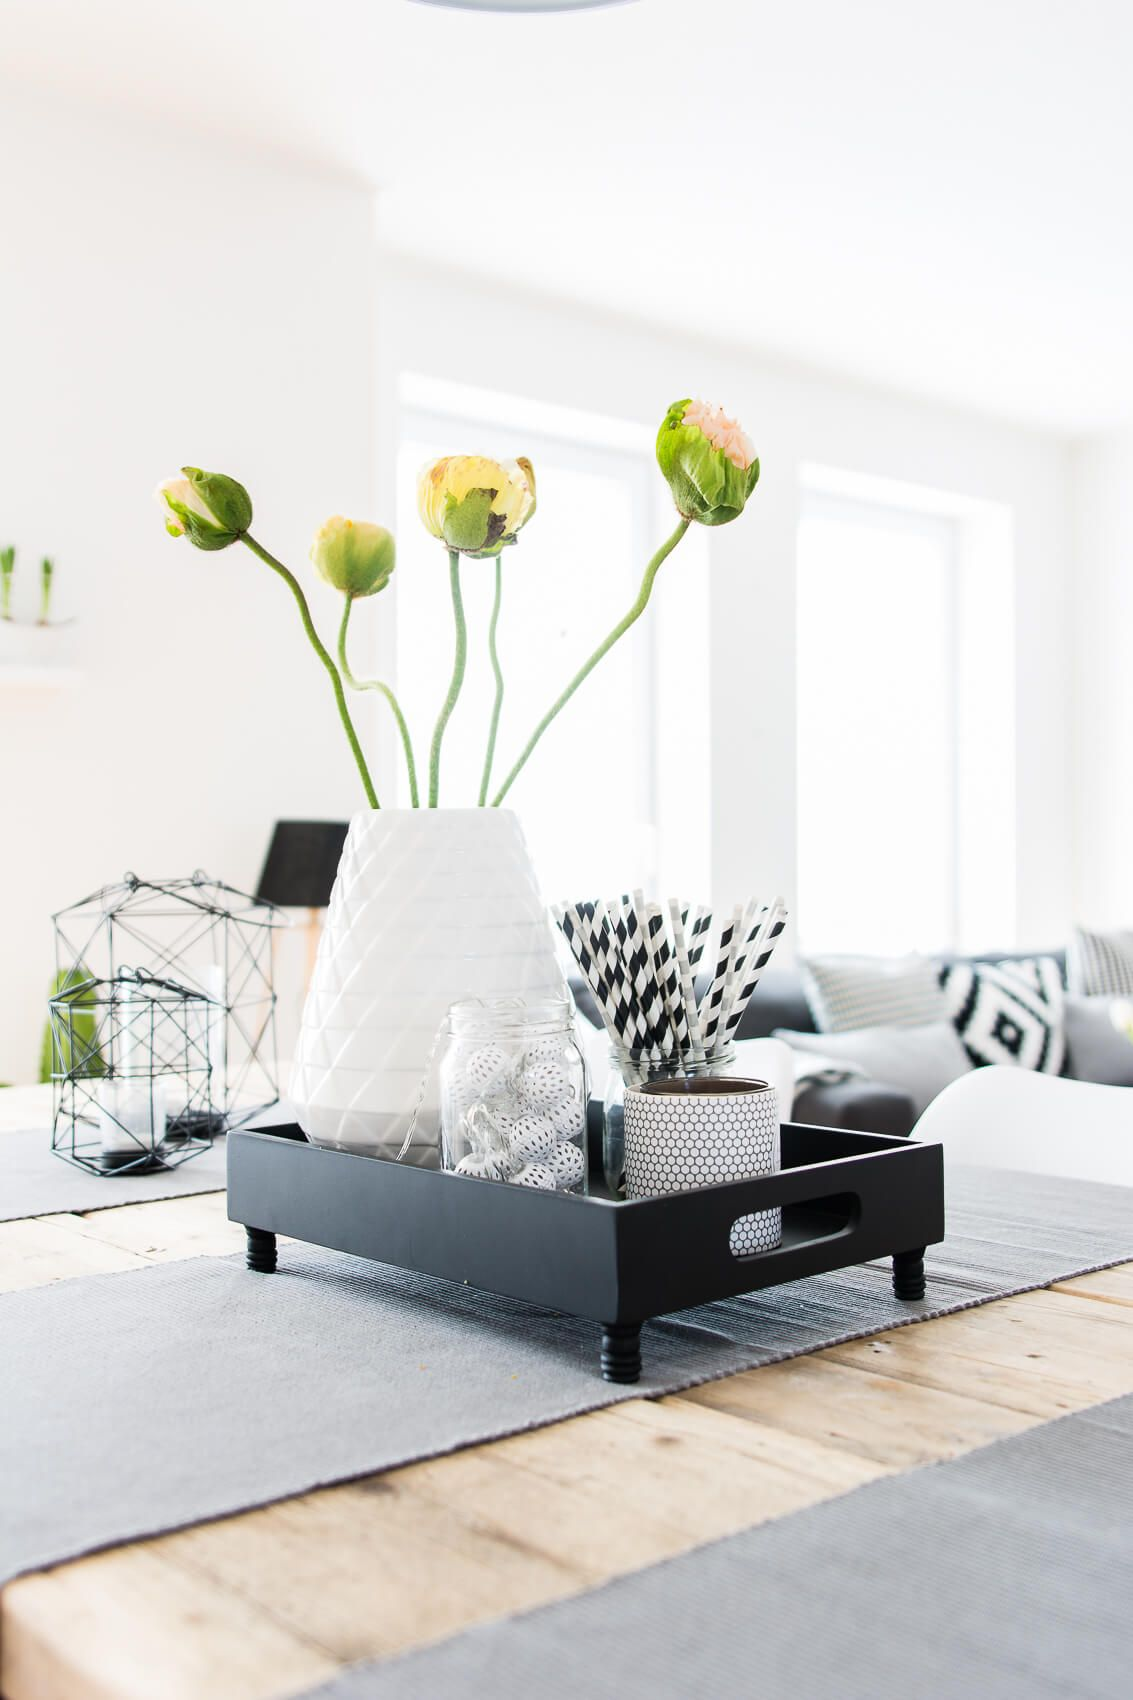 dining room - living room - Esszimmer - Wohnzimmer - decoration ...